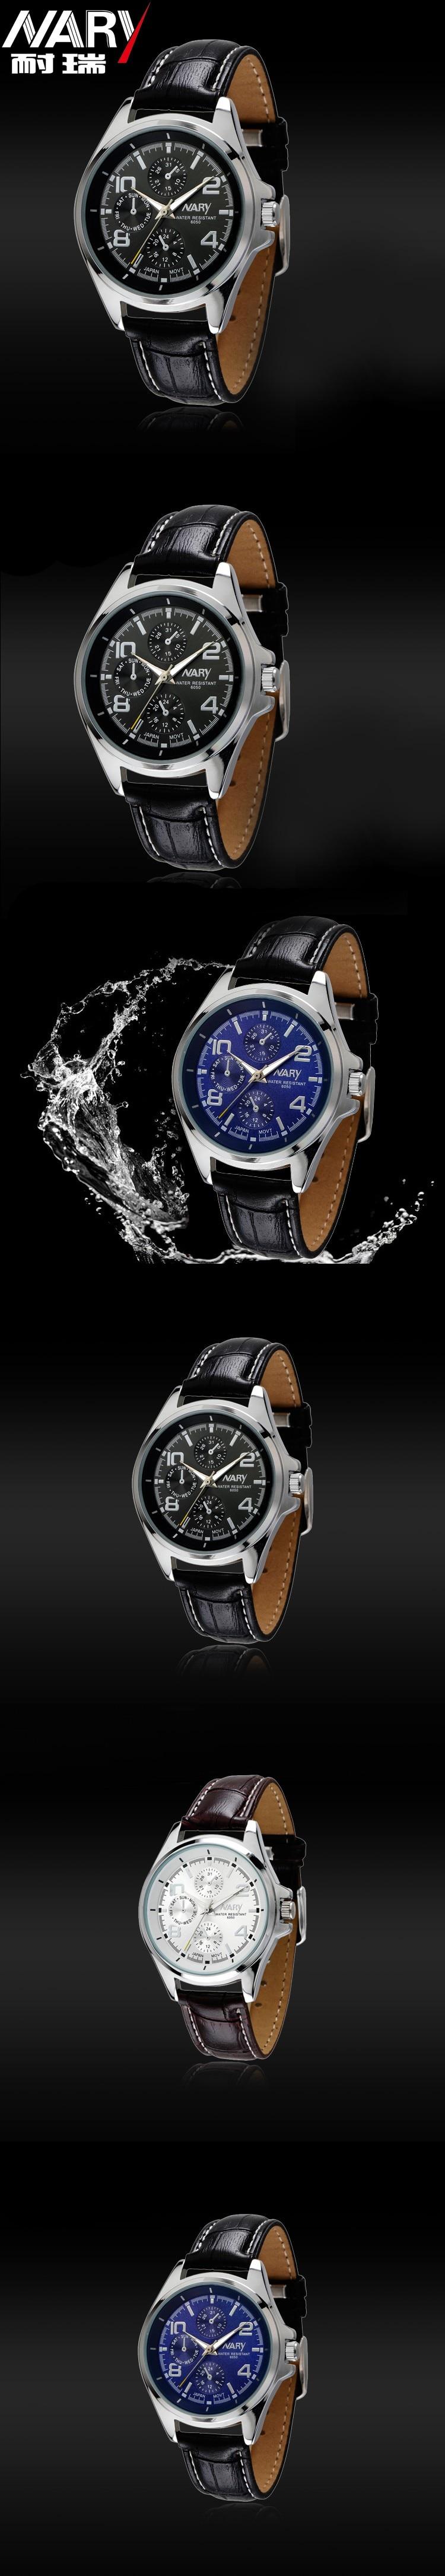 HTB1hQh1JFXXXXcIXpXXq6xXFXXXR - Nary Часы мужчины люксовый бренд Бизнес часы кварцевые часы спортивные мужчины полный стали наручные часы Повседневное часы Relogio Masculino 2016